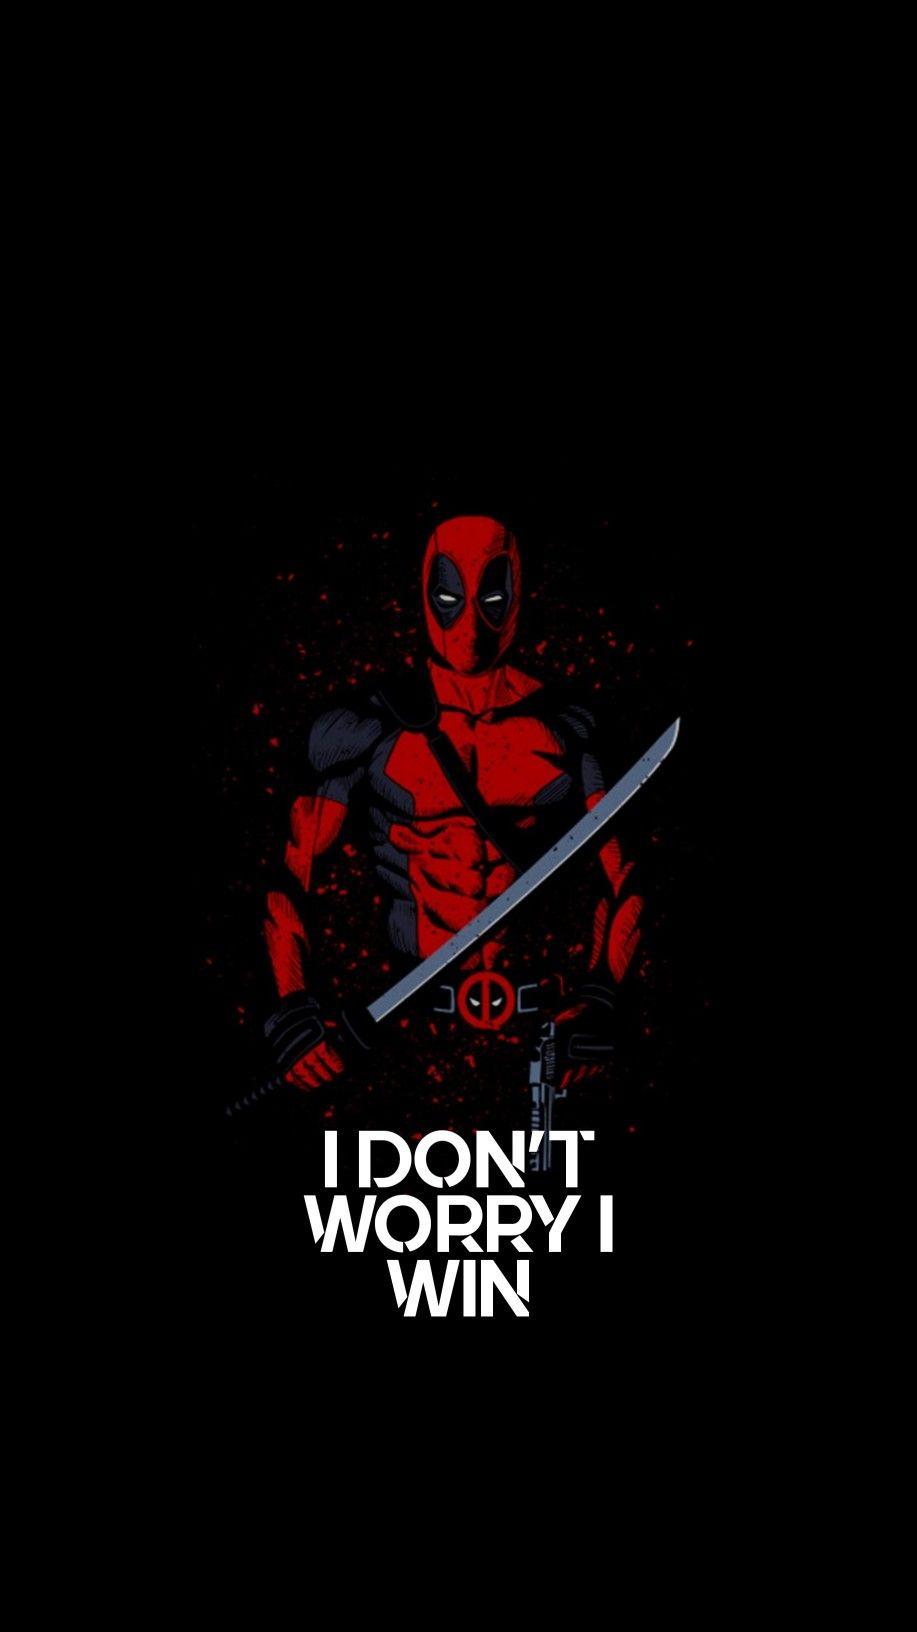 I Dont T Worry I Win Deadpool Artwork Deadpool Comic Deadpool Wallpaper Iphone 6 deadpool wallpaper hd 4k